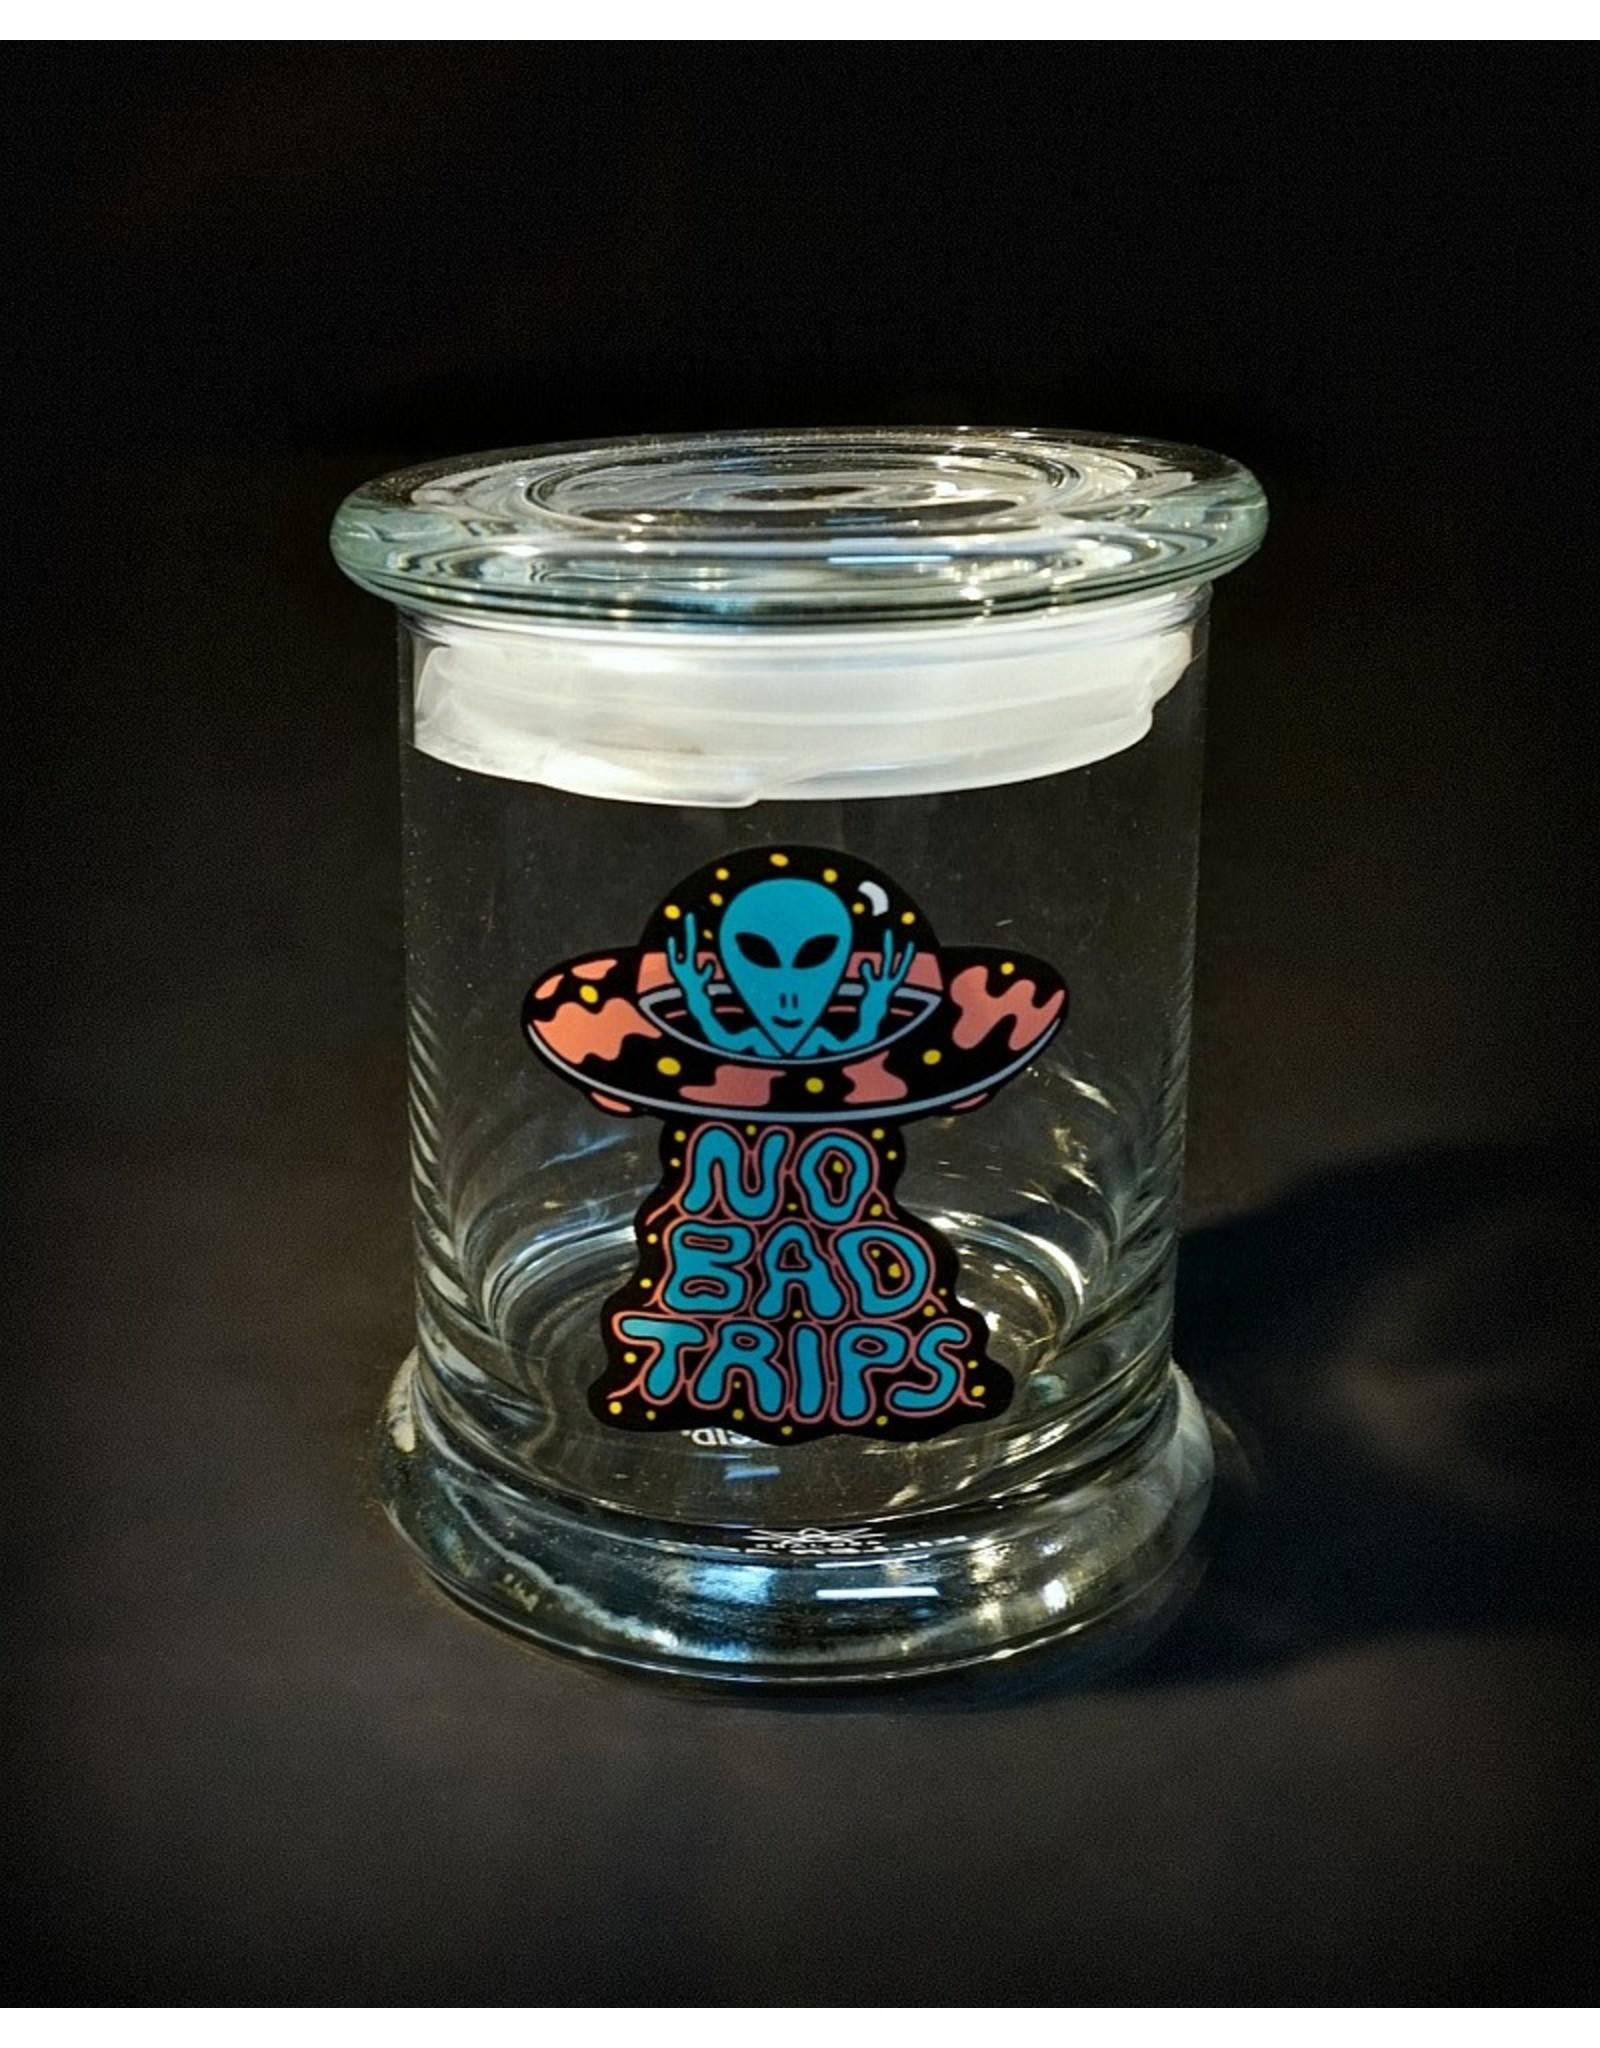 420 Science 420 Science Jars Large No Bad Trips Pop Top